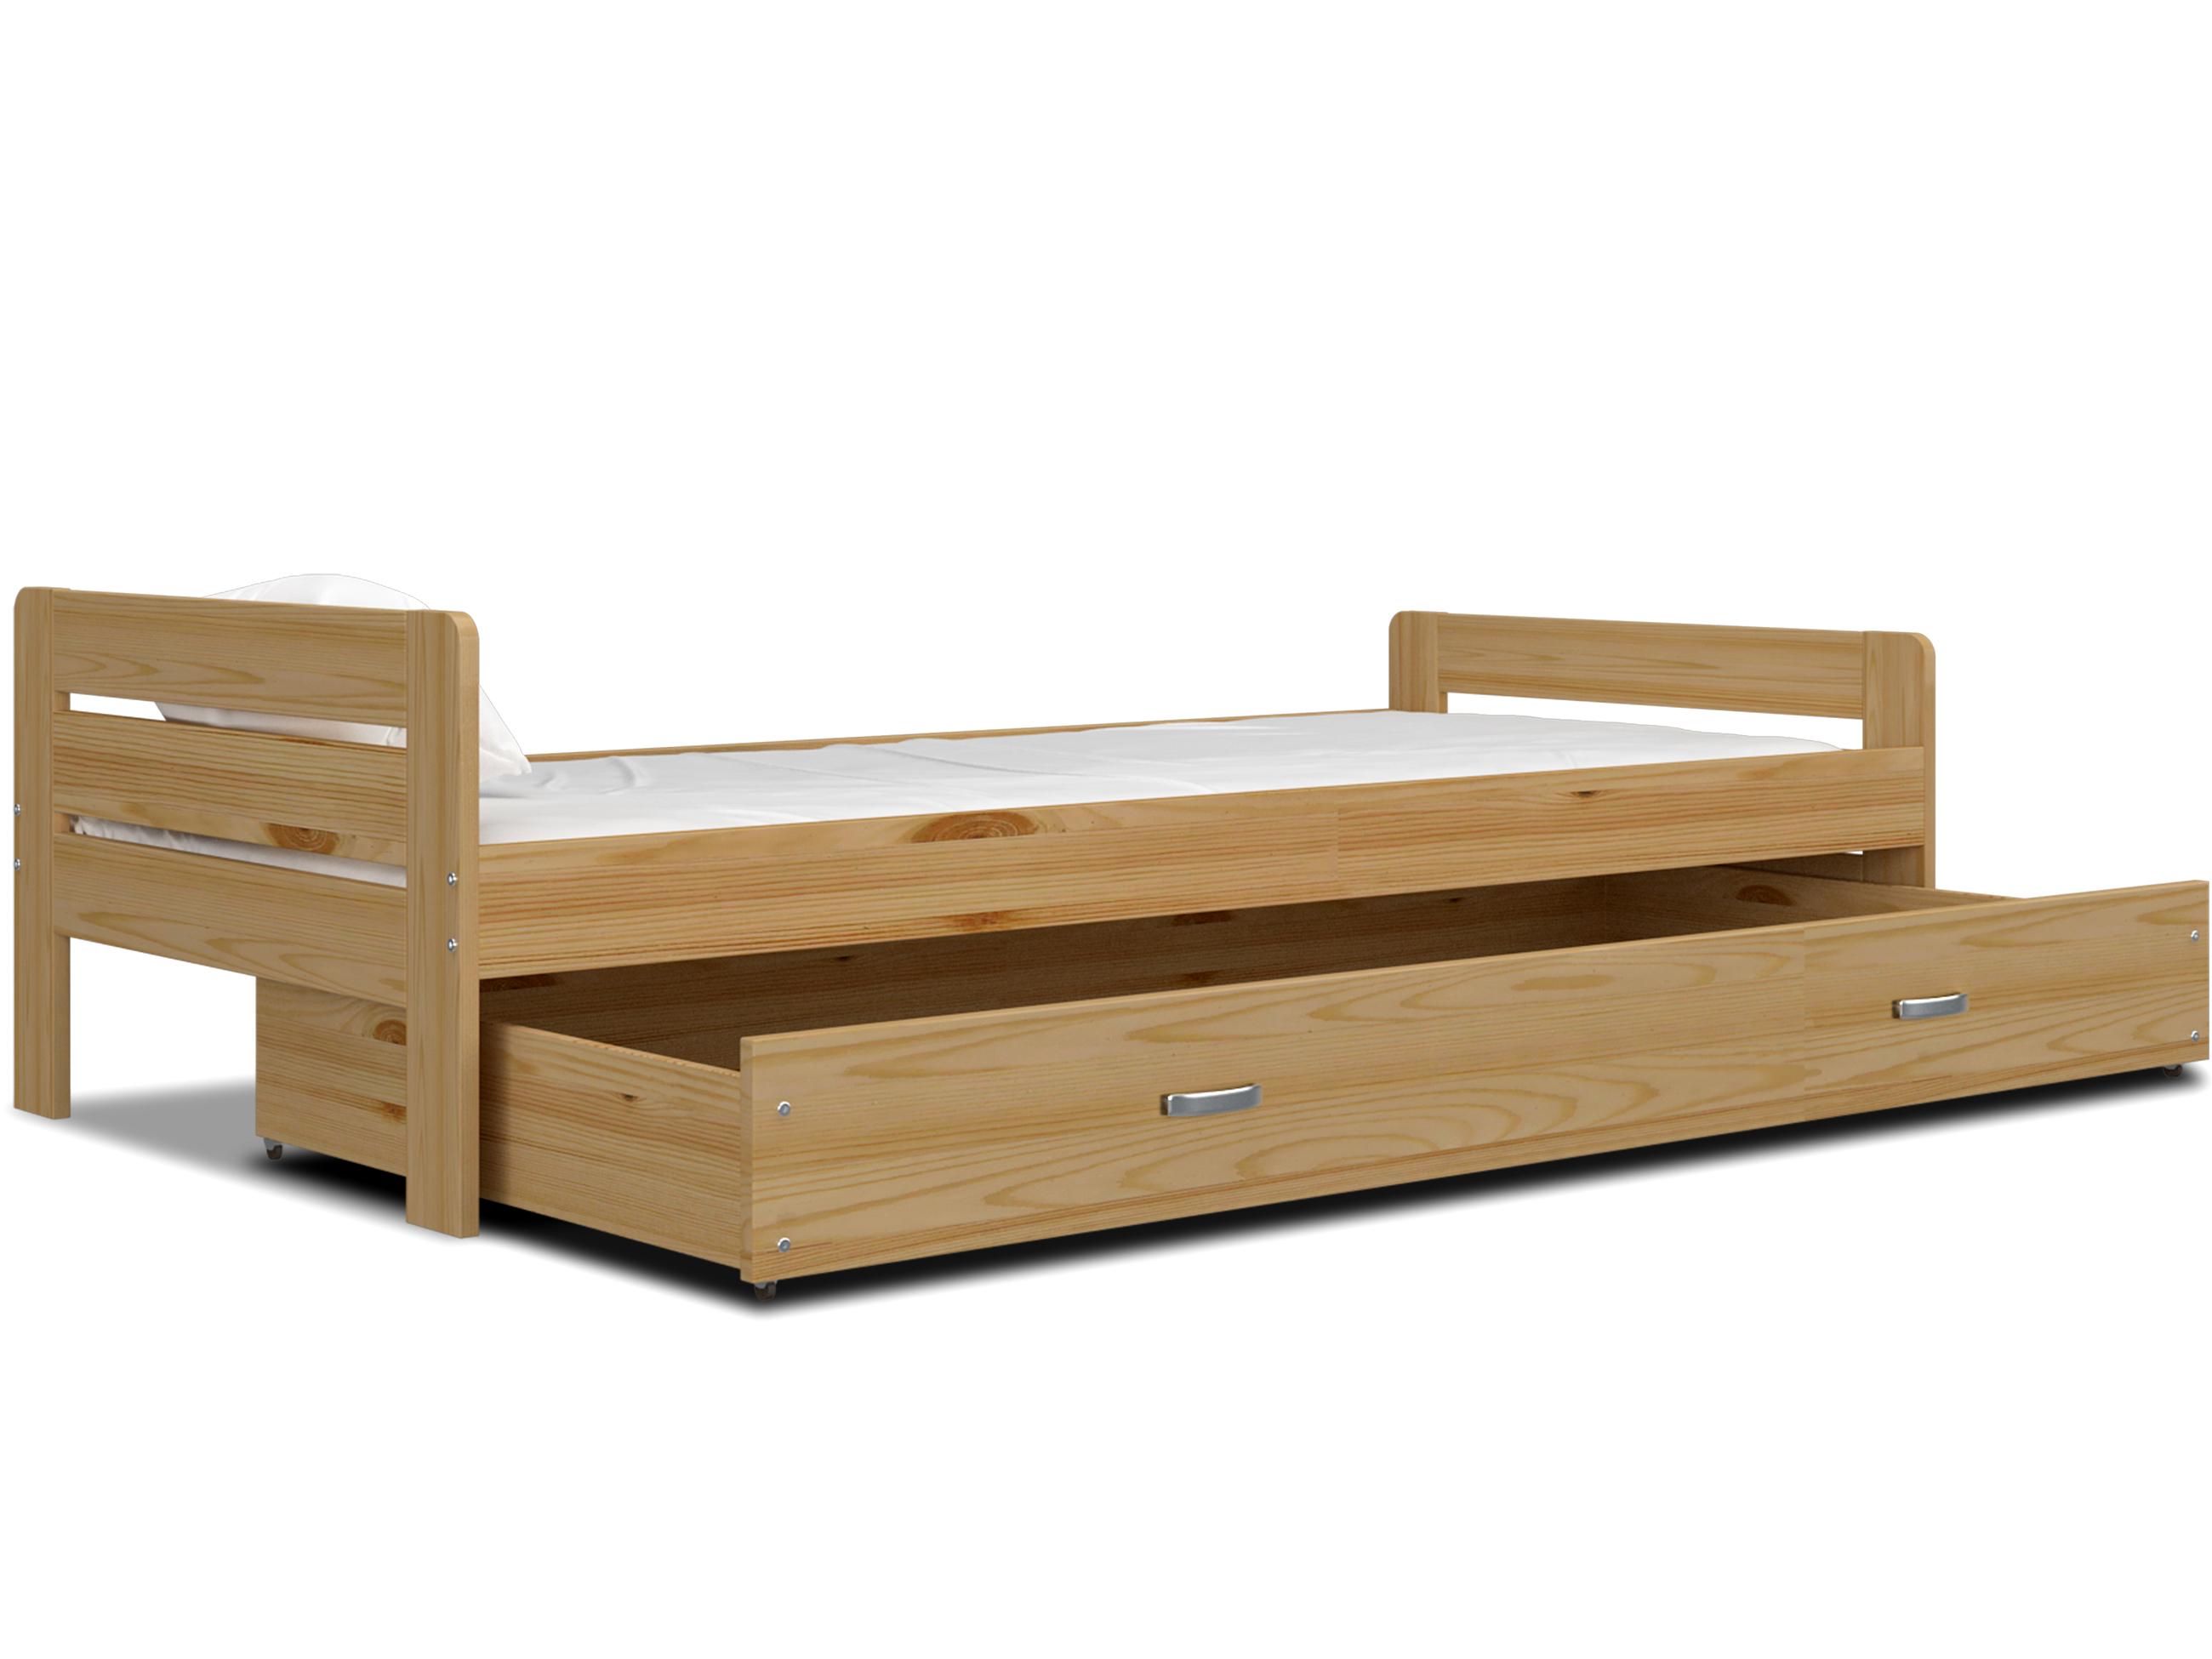 ArtAJ Detská posteľ BARTEK Farba: Borovica - drevo